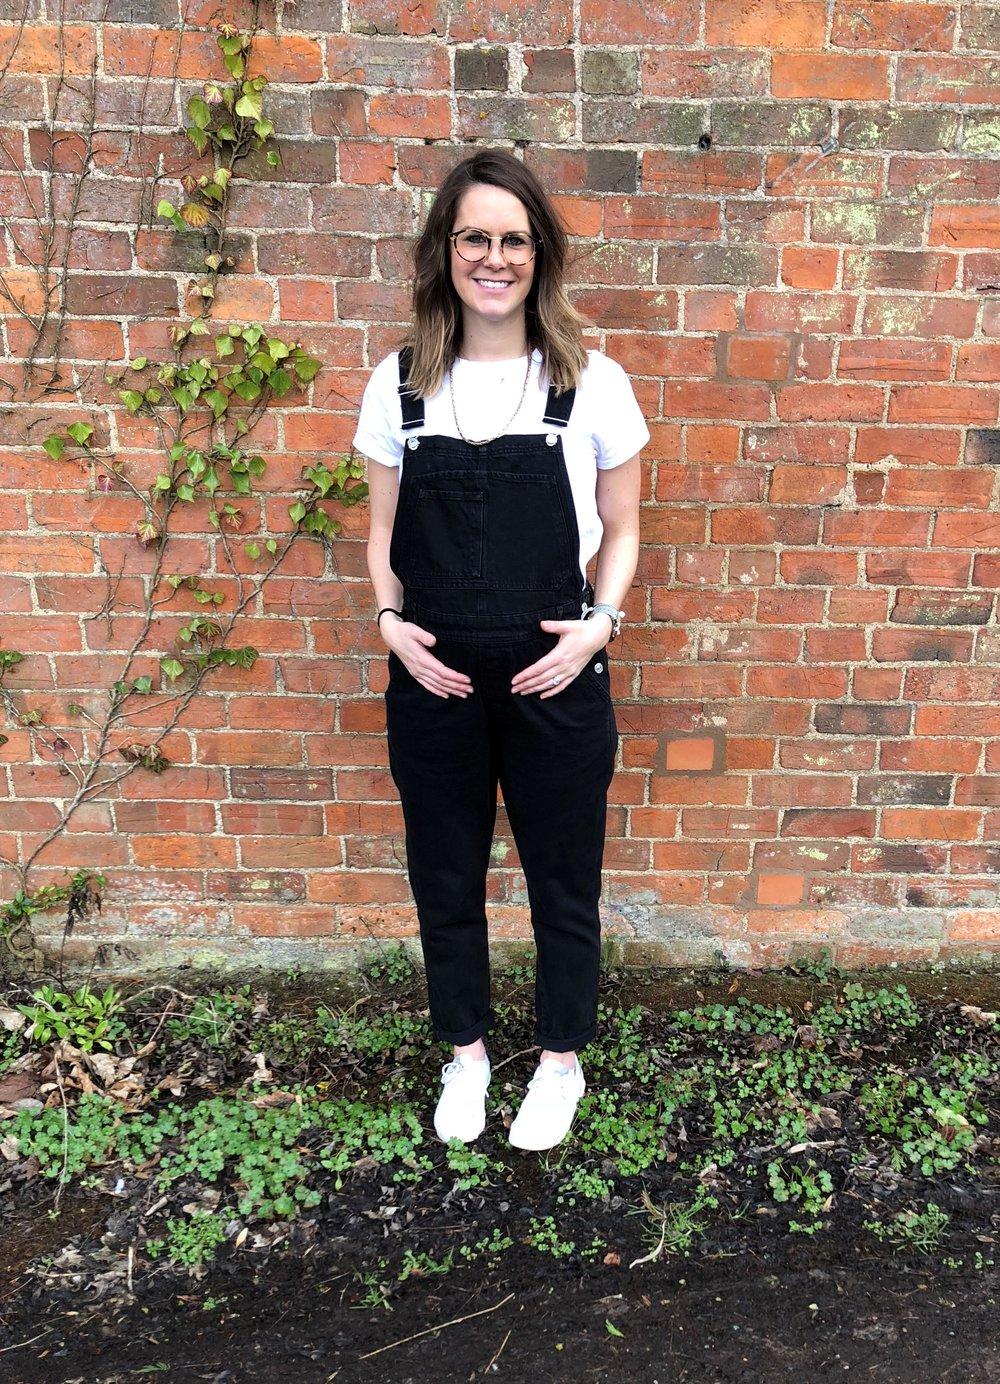 Pregnant walk - Alana Gray